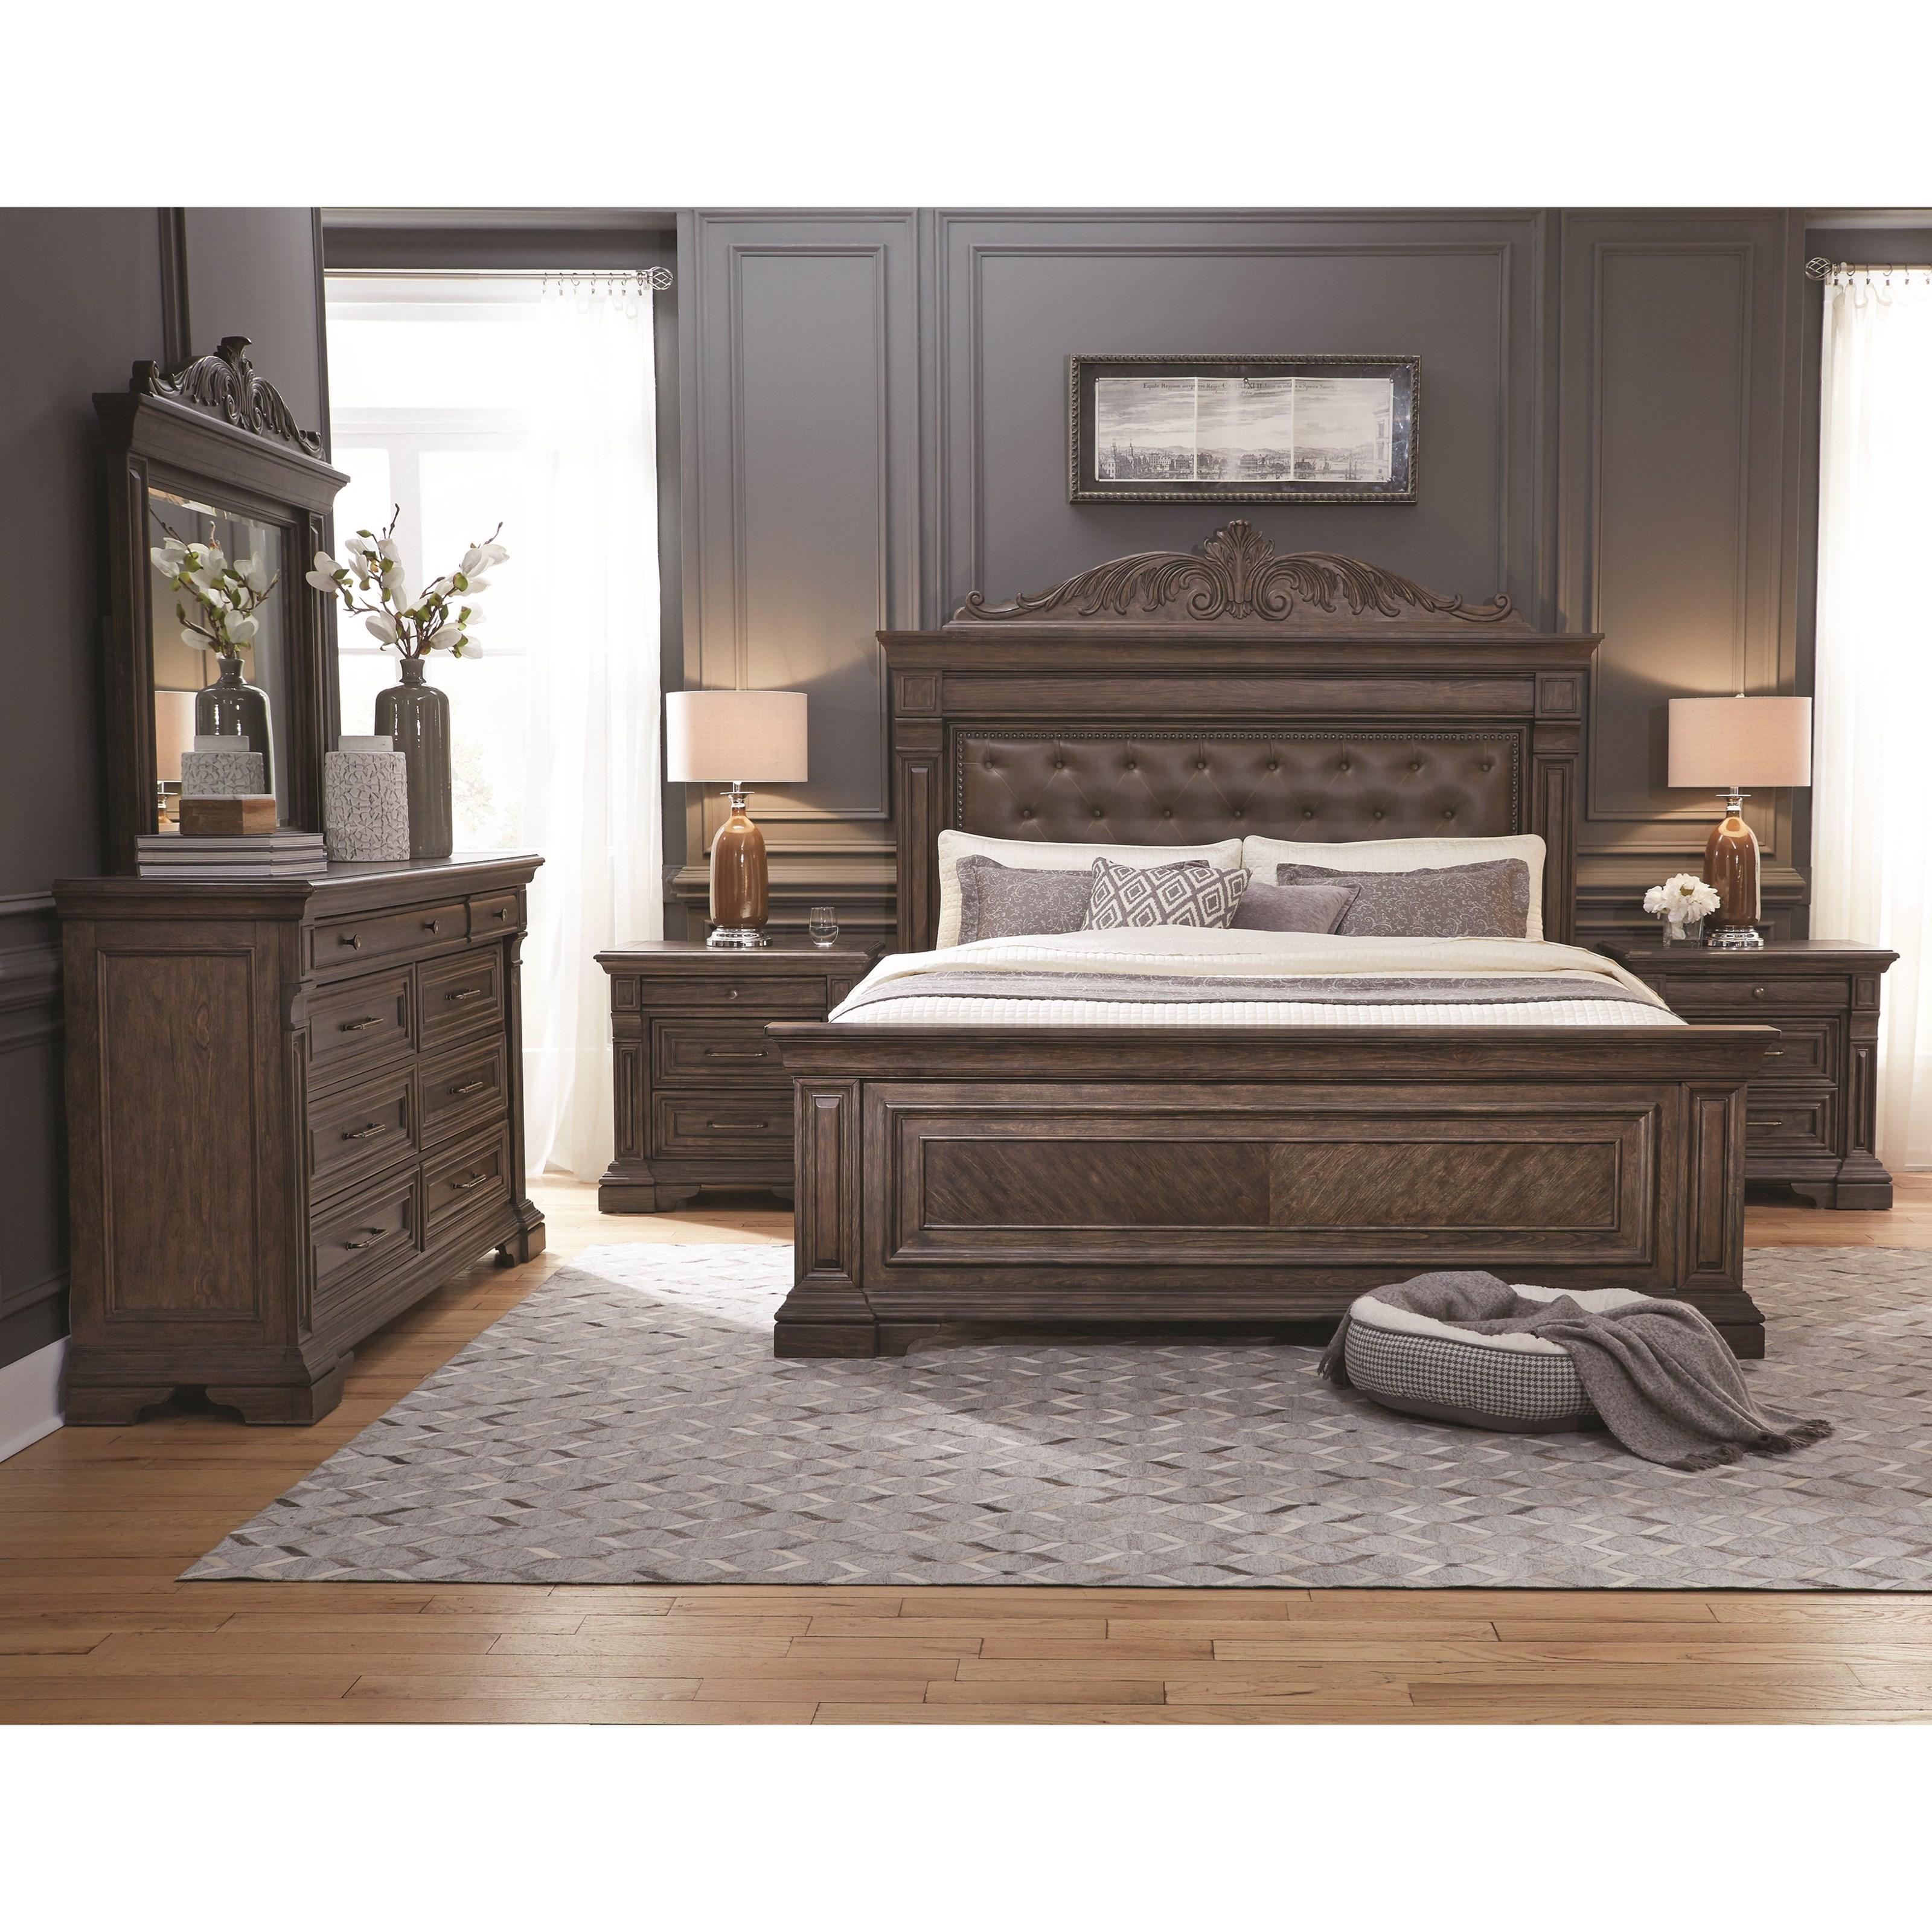 Pulaski Furniture Bedford Heights Queen Bedroom Group